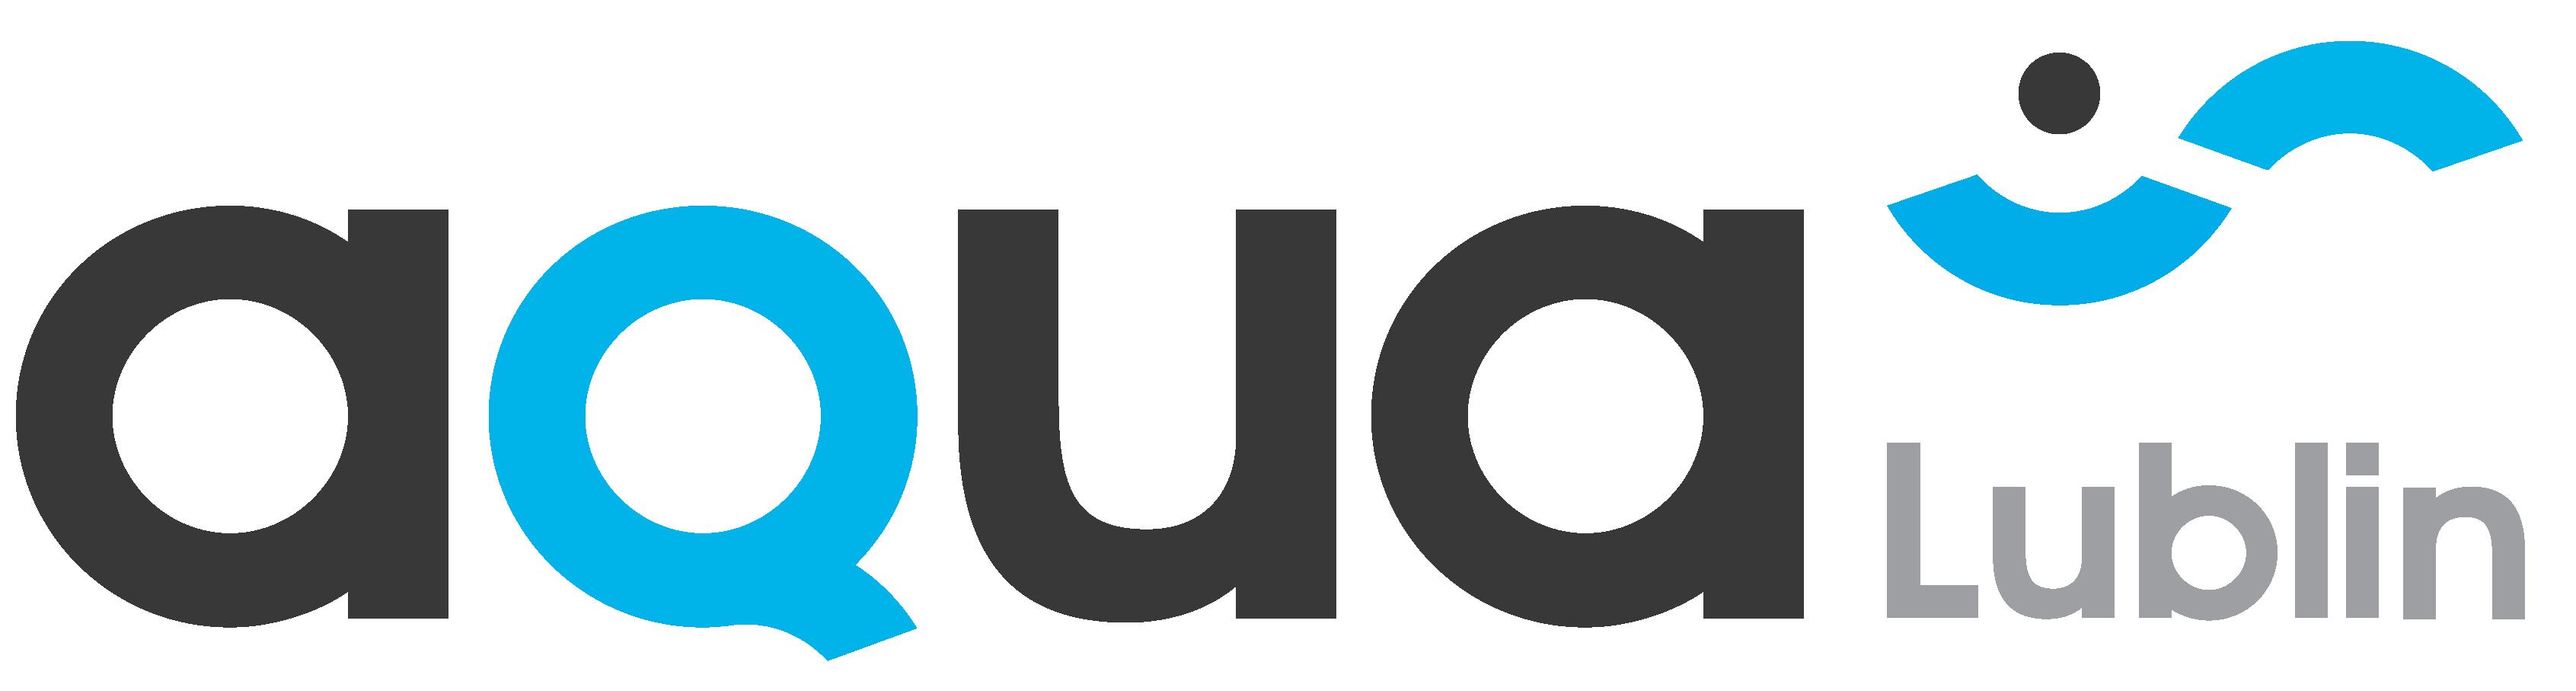 Logo Aqua Lublin - pełny kolor